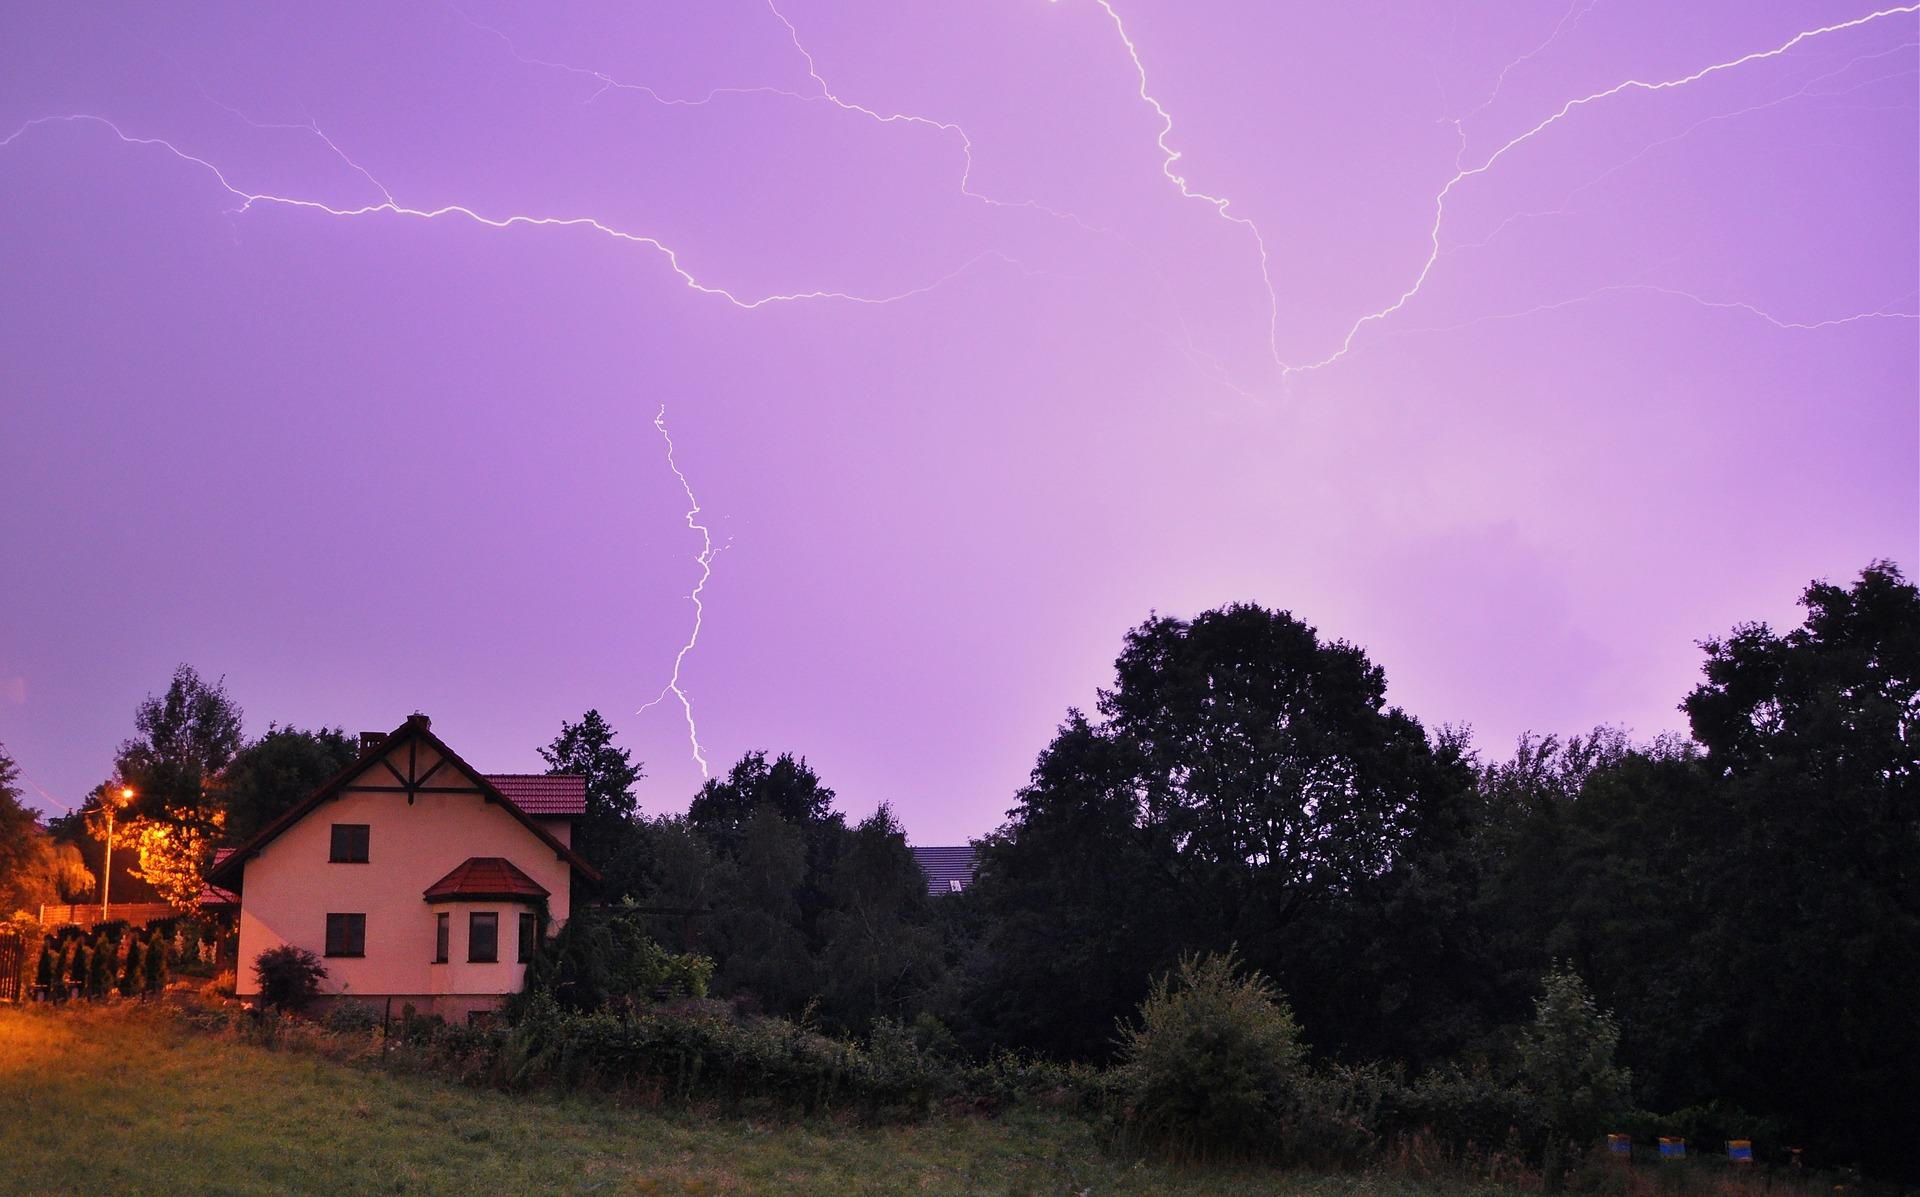 storm-2496251_1920.jpg